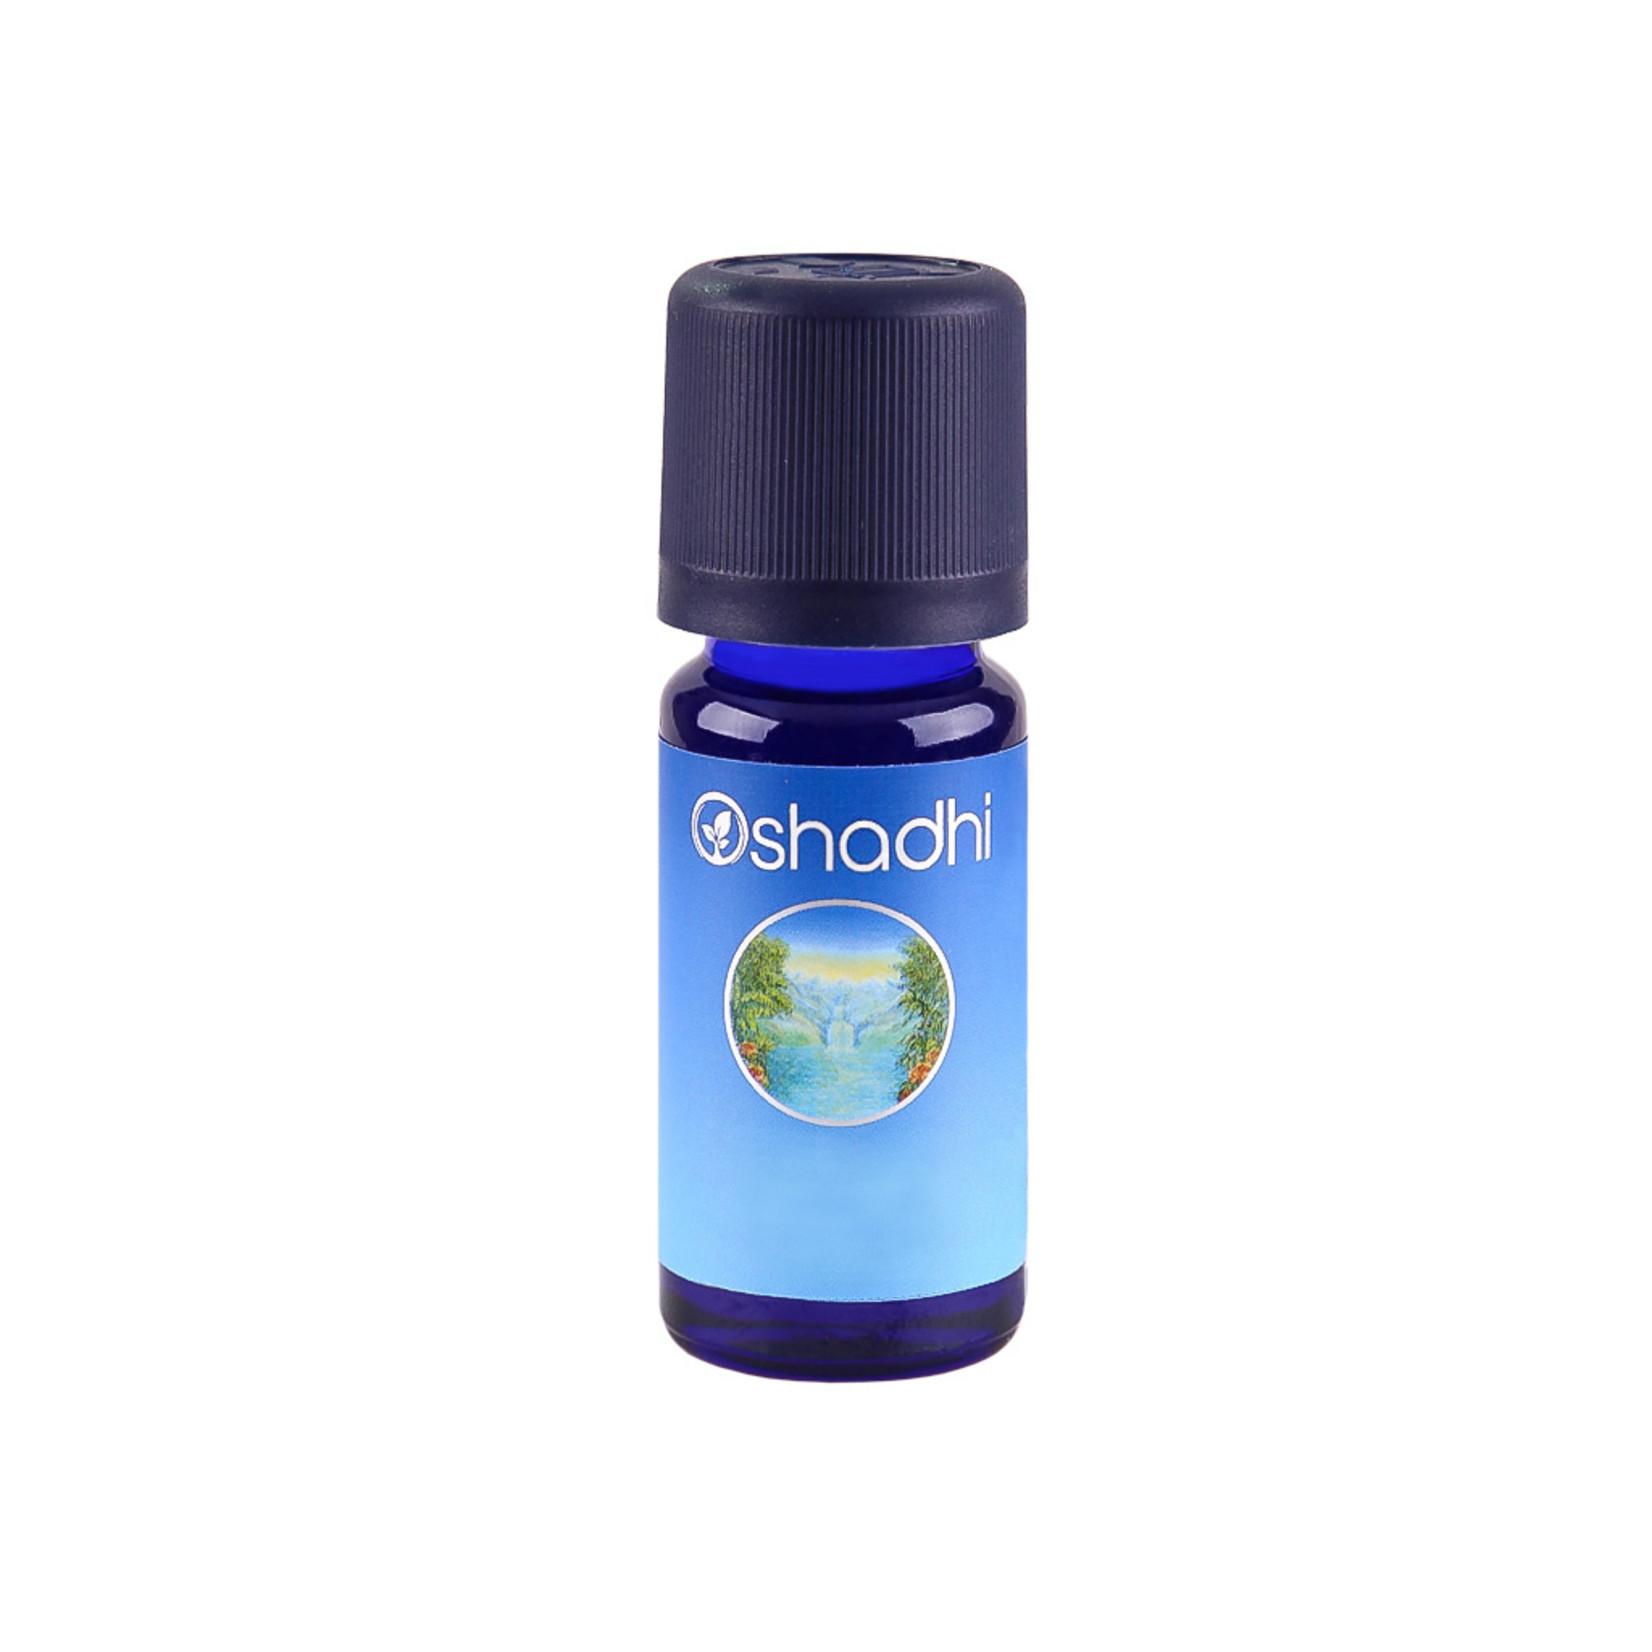 Oshadhi Echte Lavendel Hoogland BIO Oshadhi - moeder van alle oliën - 10ml